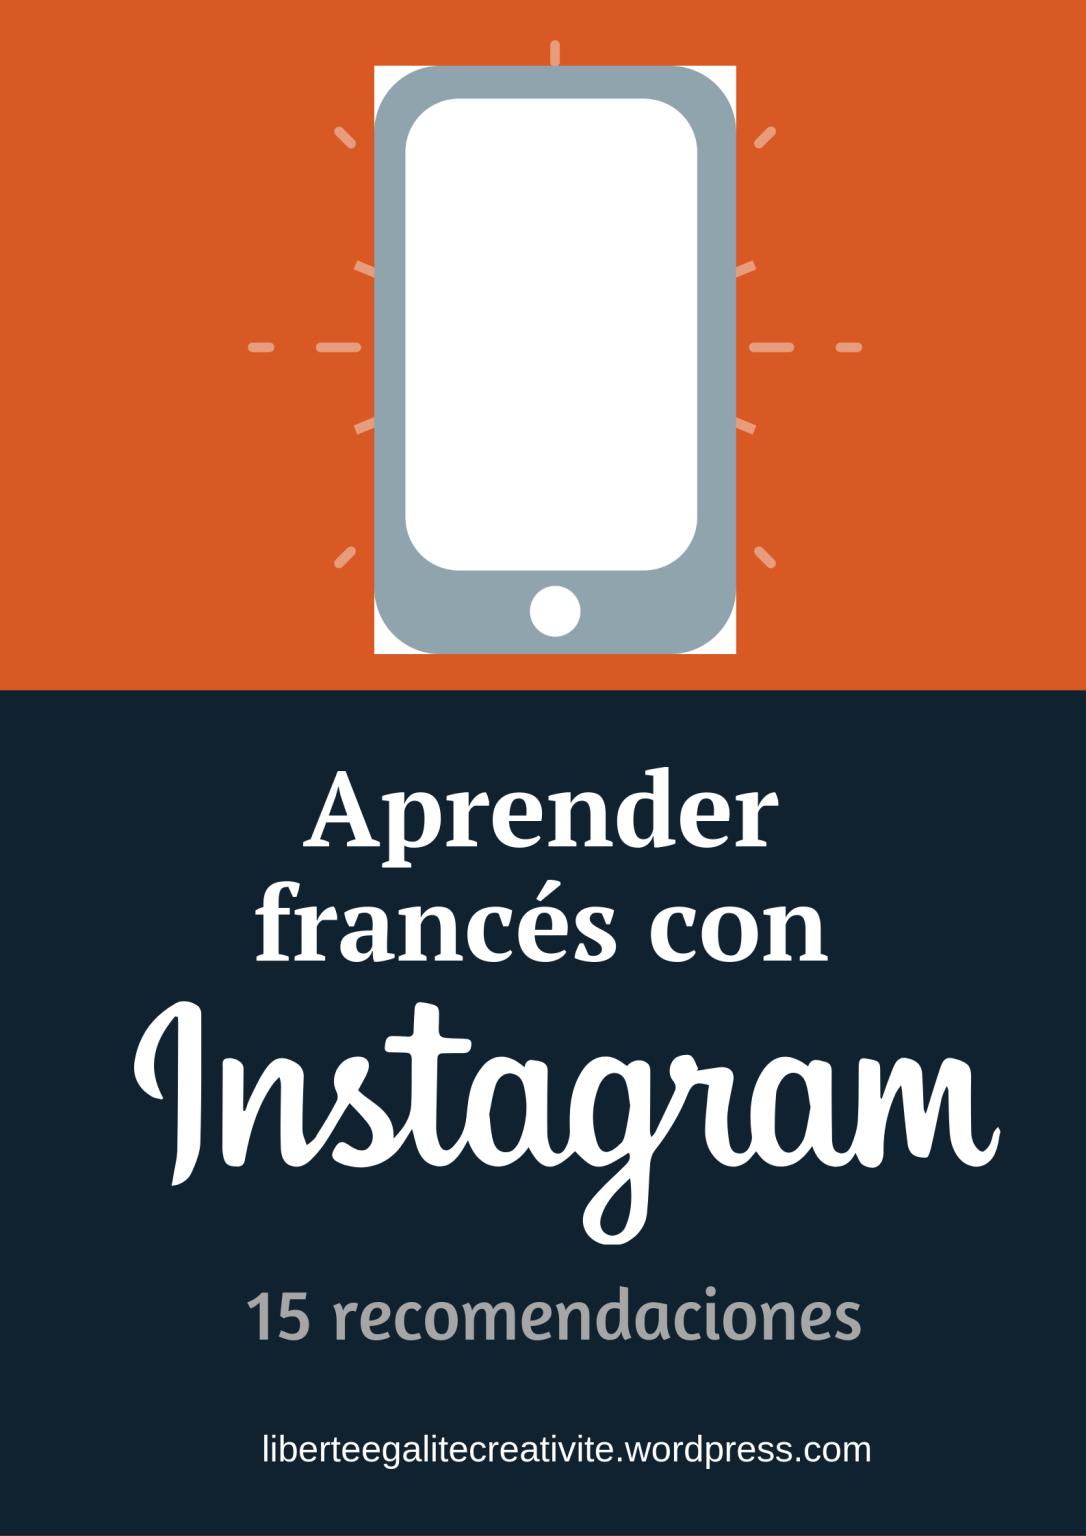 Aprender francés con Instagram.png